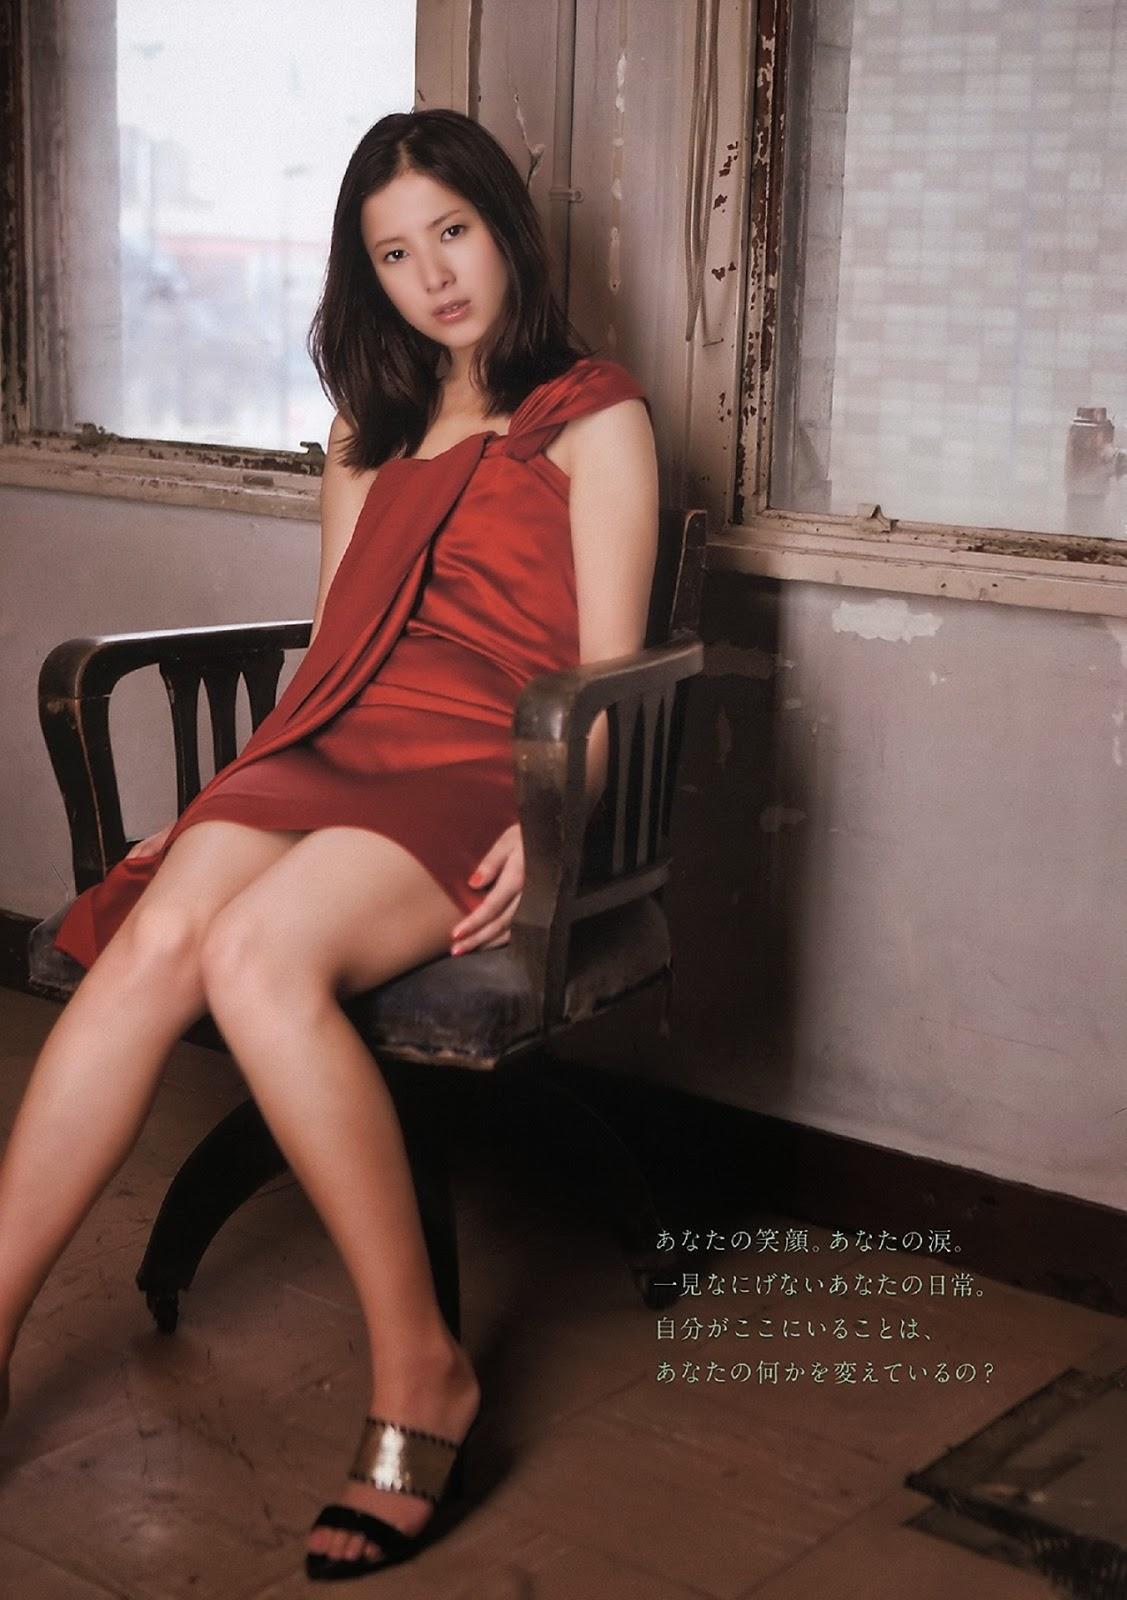 Yuriko Yoshitaka 吉高由里子 Weekly Playboy No 15 2011 Images 3